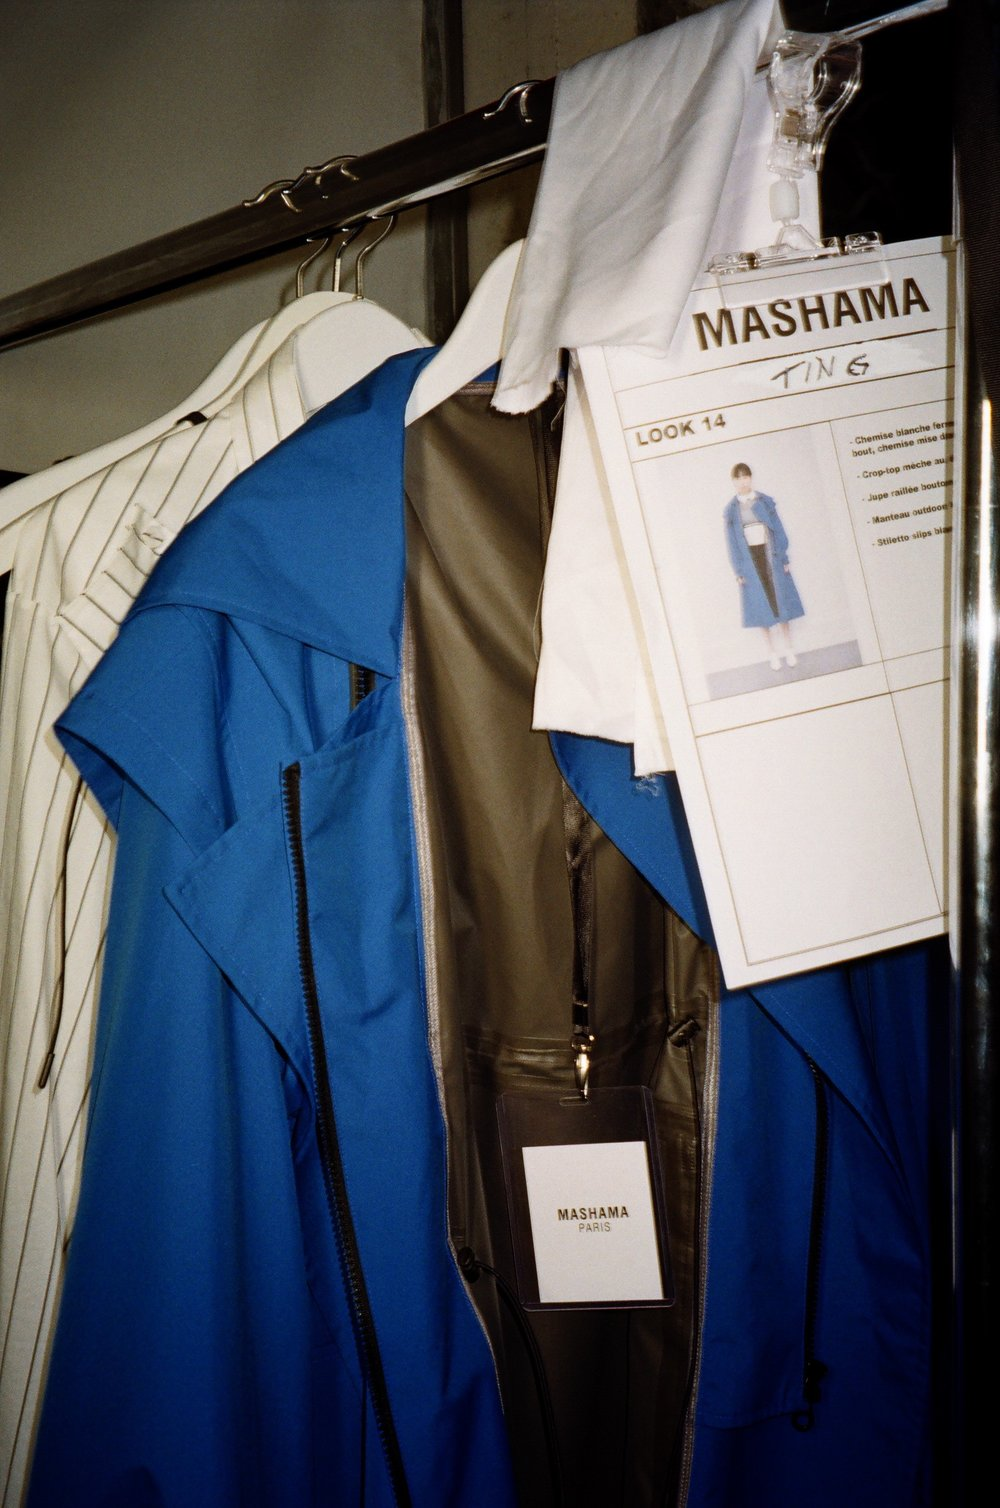 Mashama_Honigschreck_analog (35).JPG